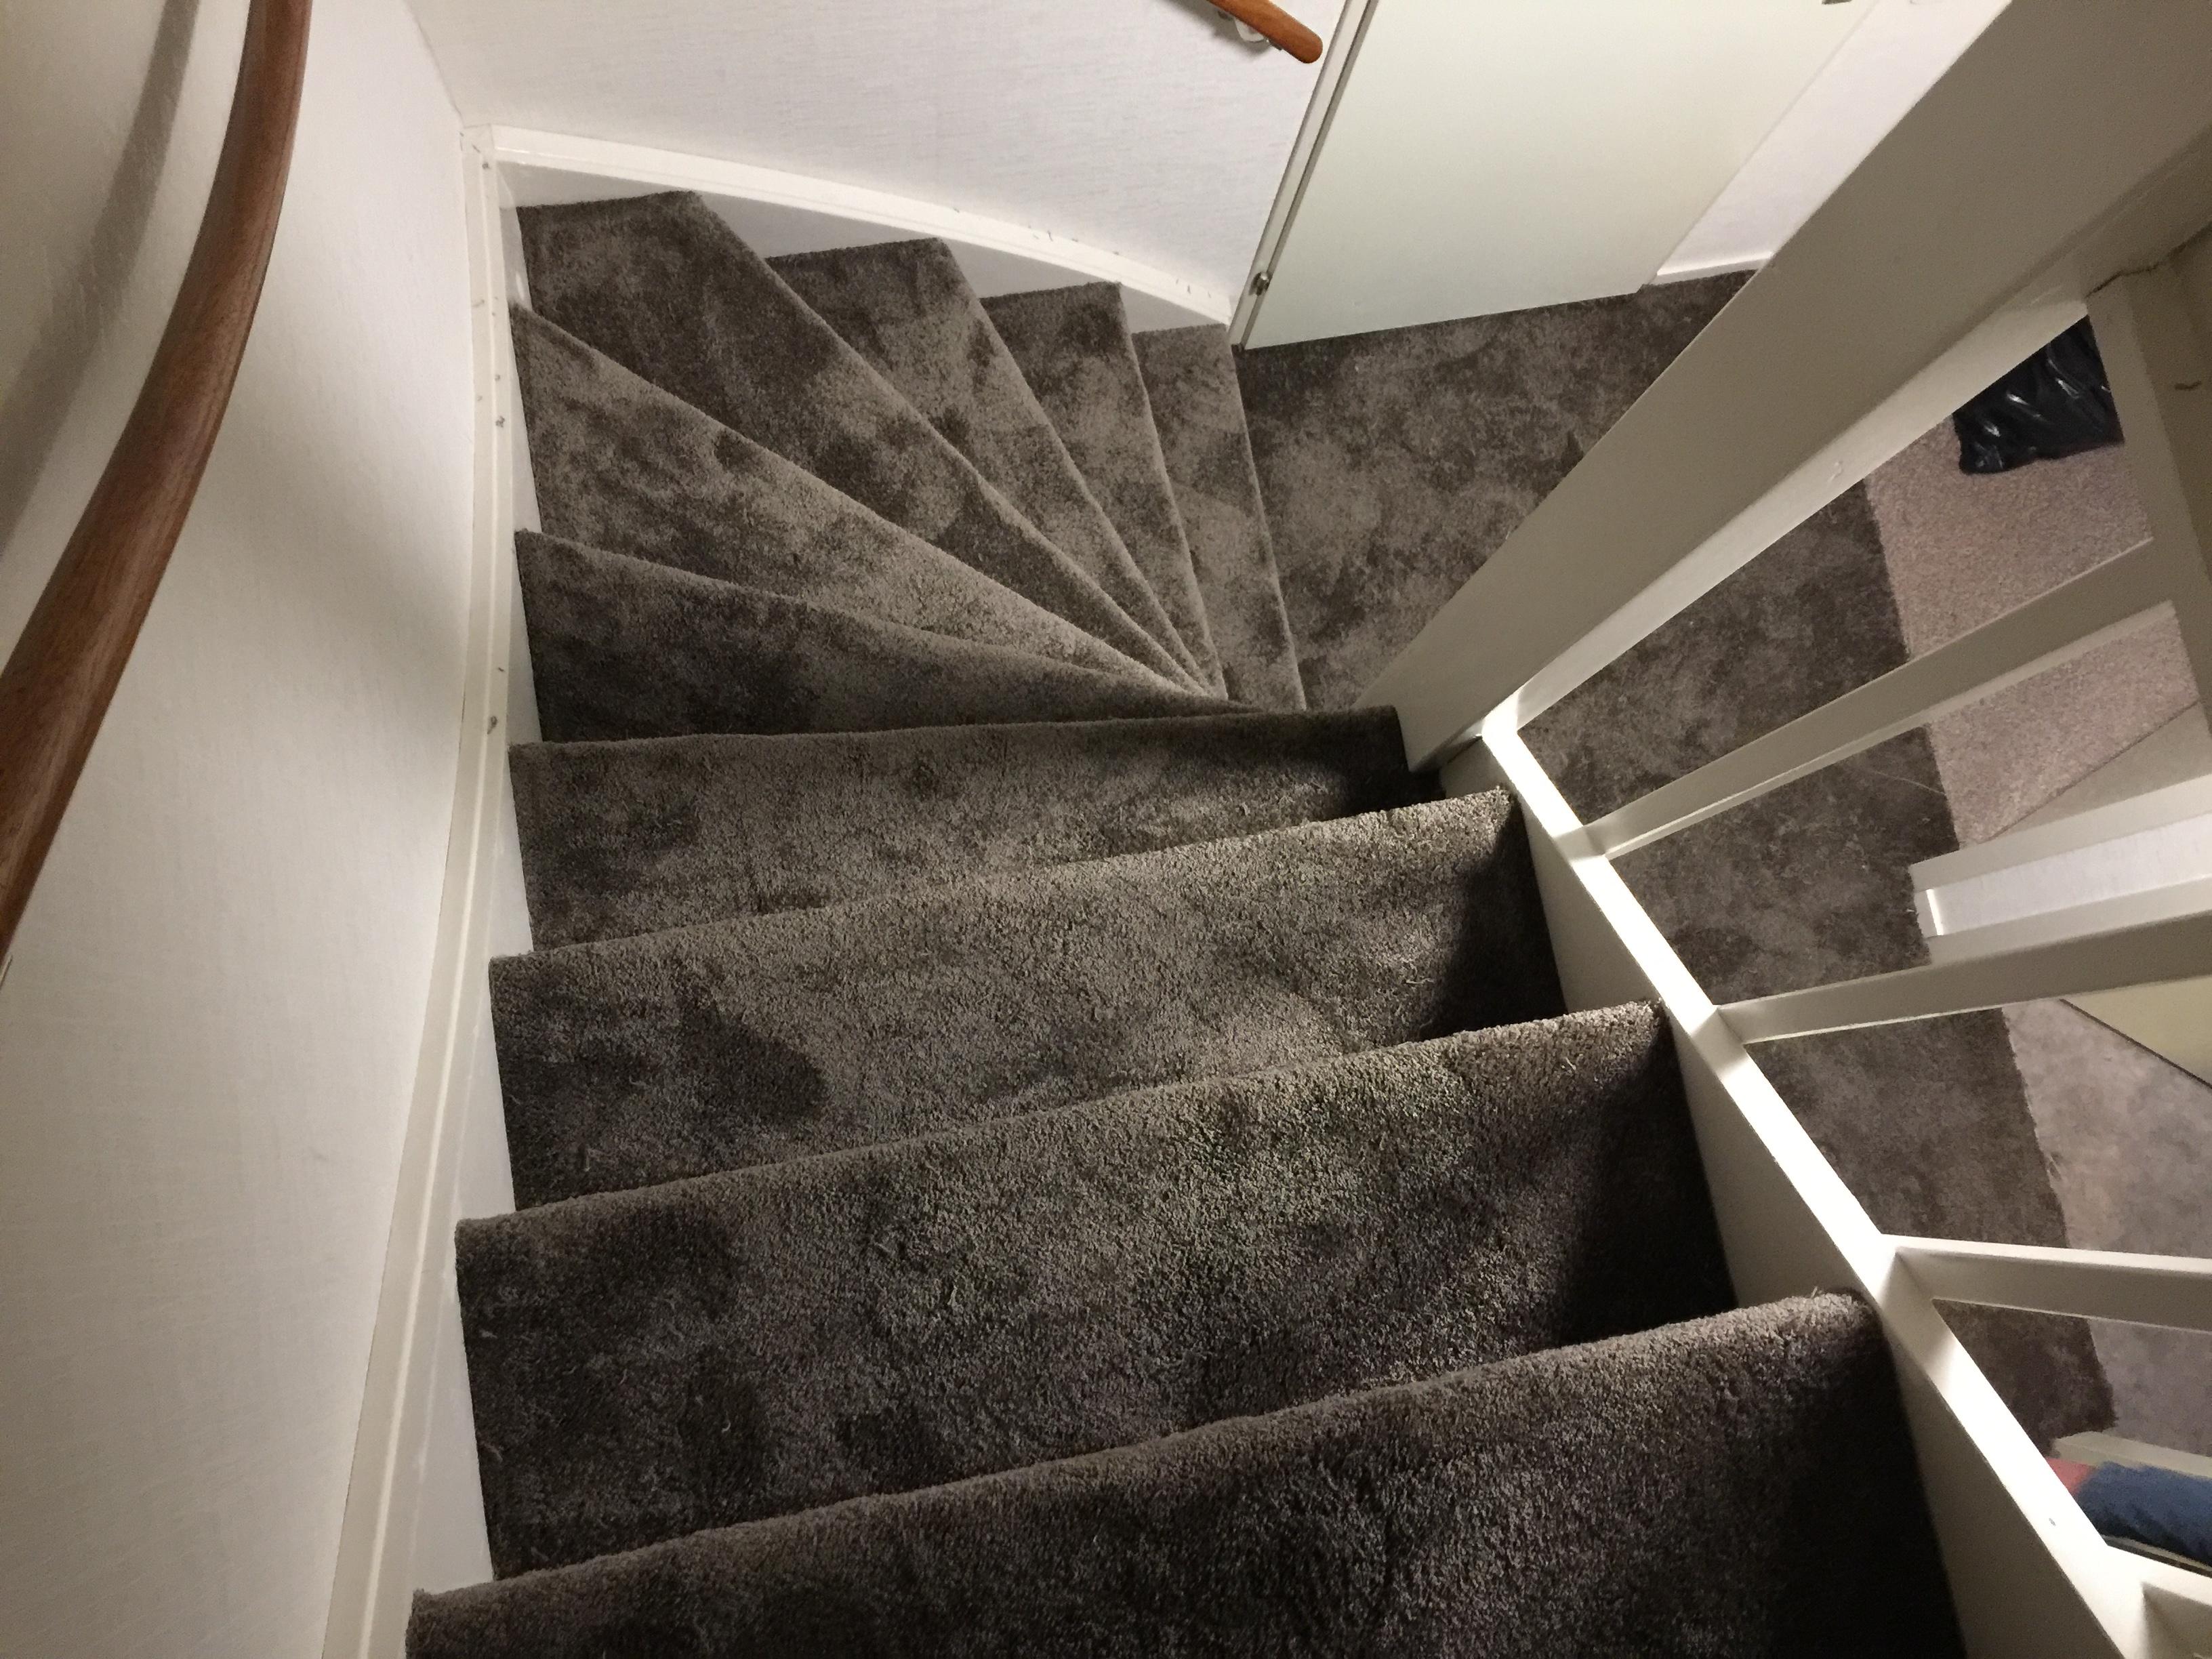 Goede Trappen bekleden Utrecht – Vakkundig en voordelig trappen stofferen JM-74